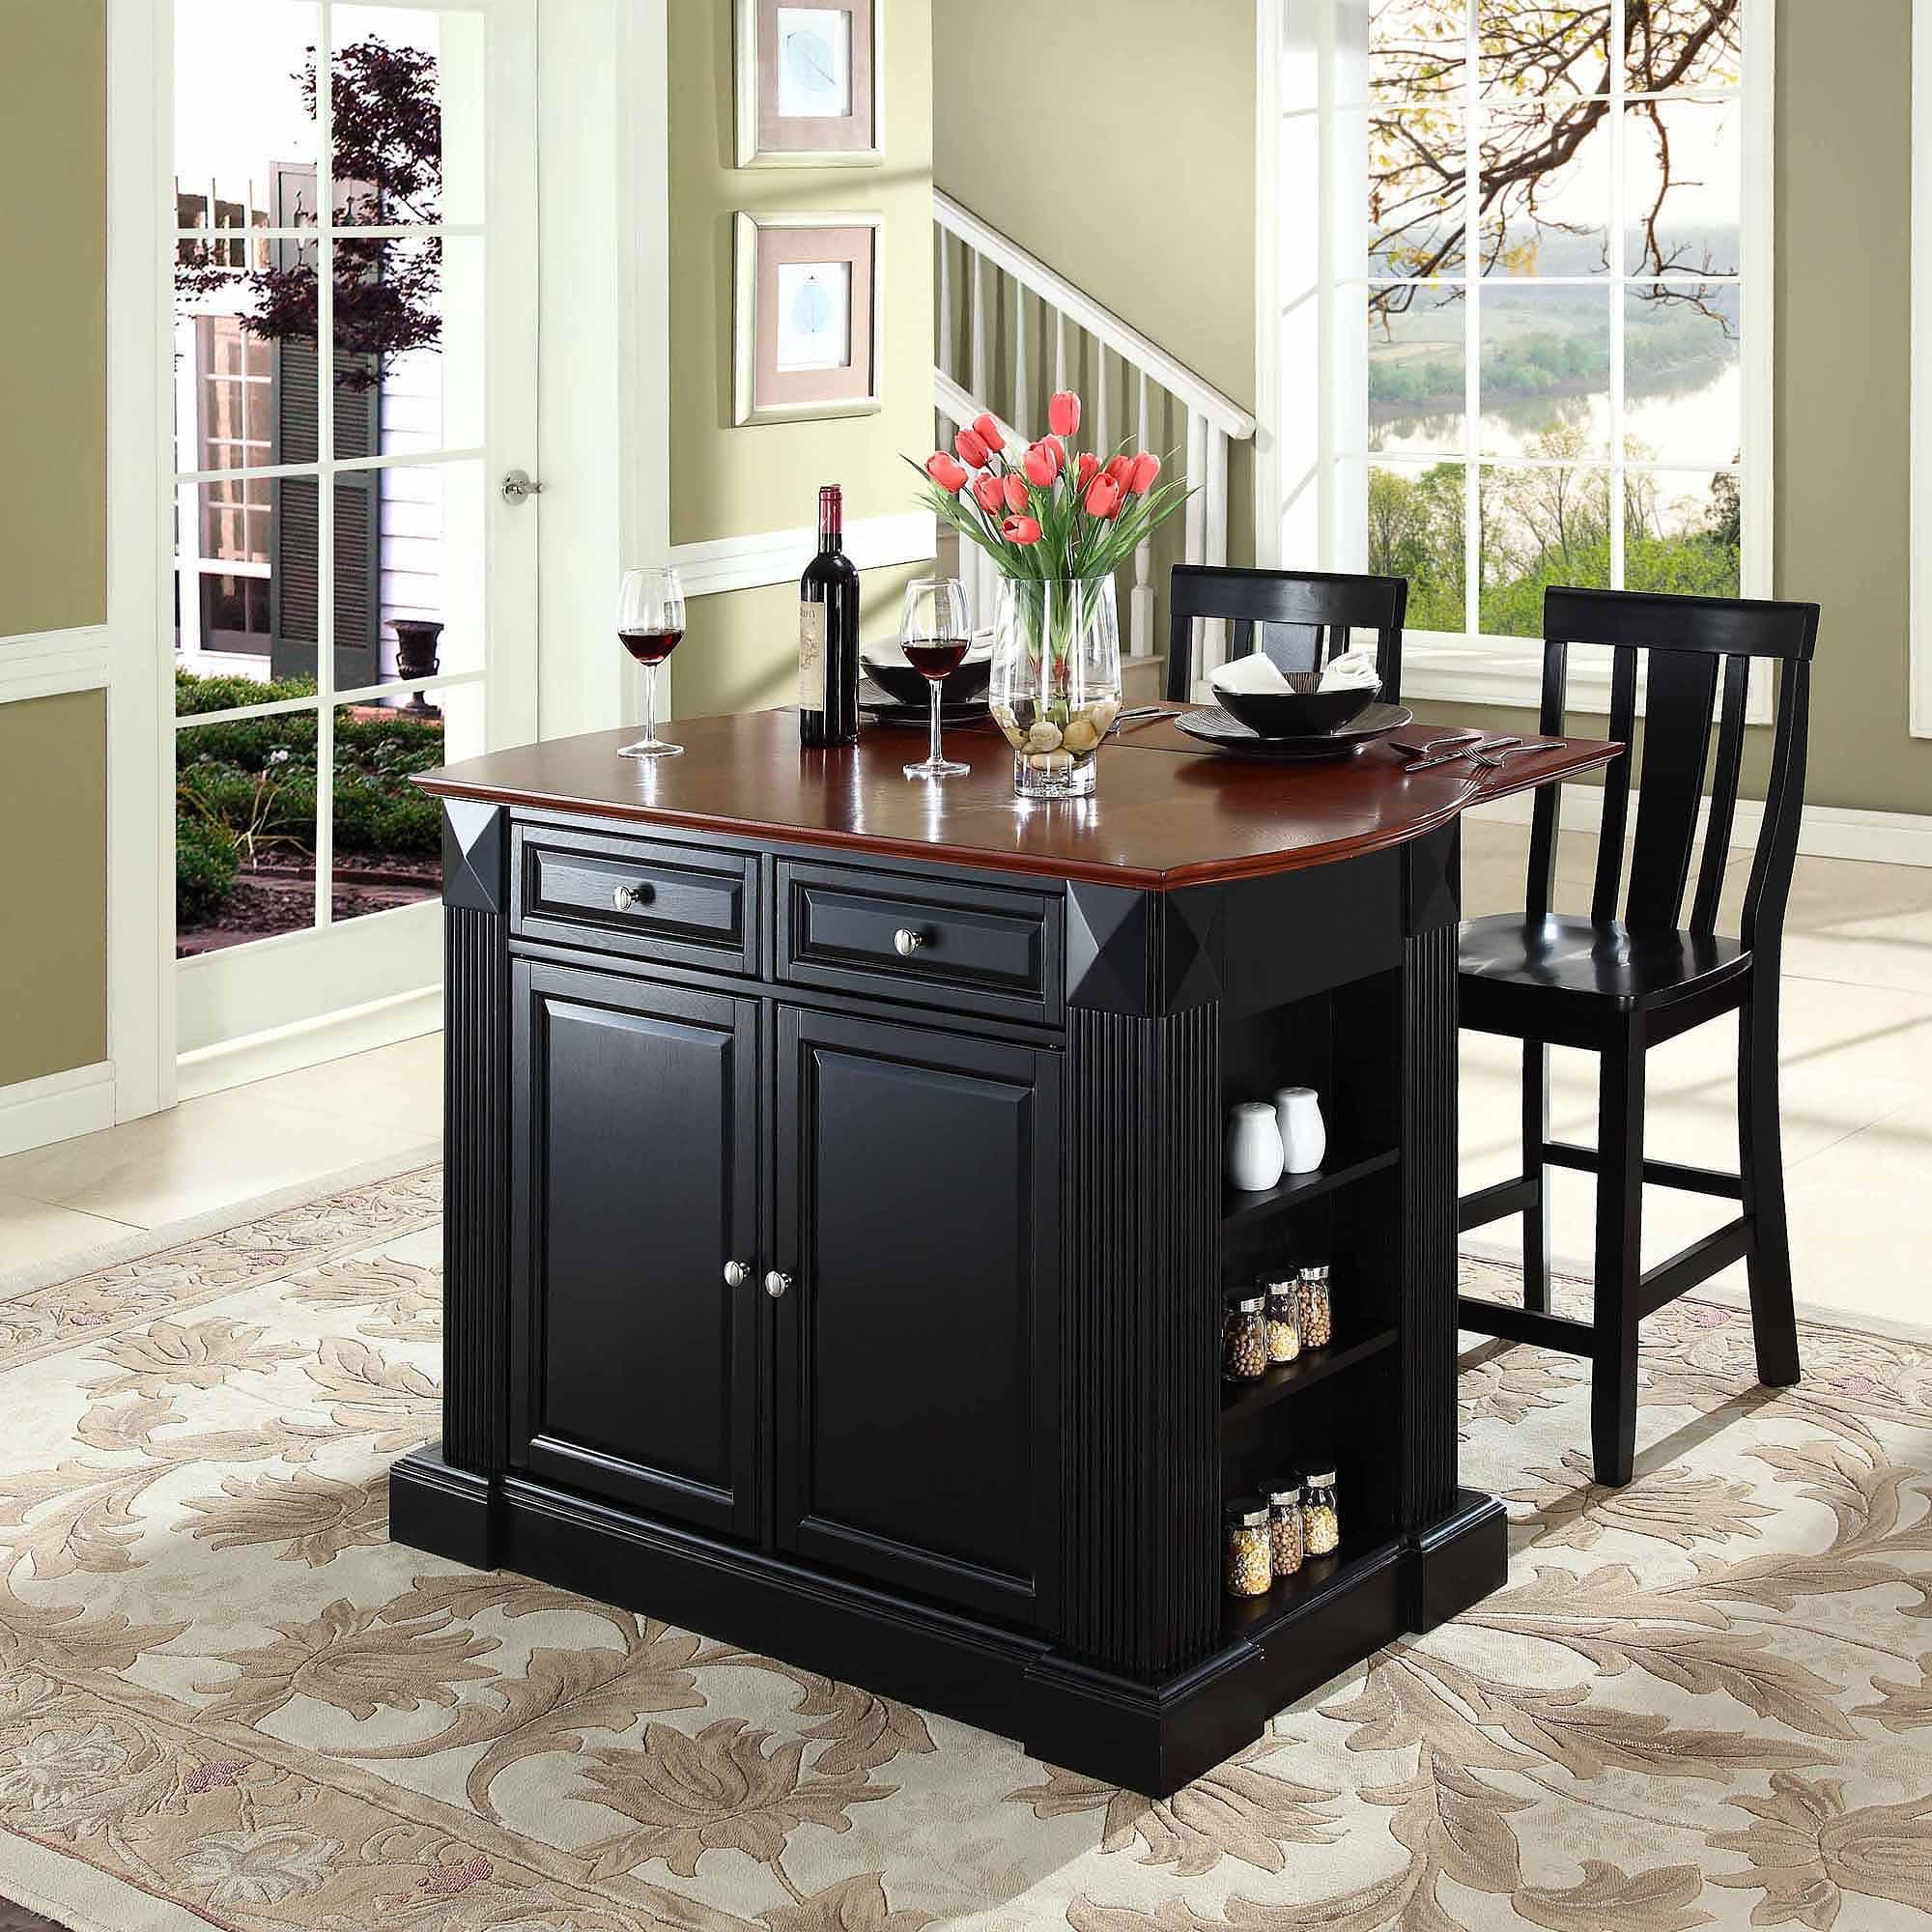 "Crosley Furniture Drop Leaf Breakfast Bar Top Kitchen Island with 24"" Shield Back Stools"